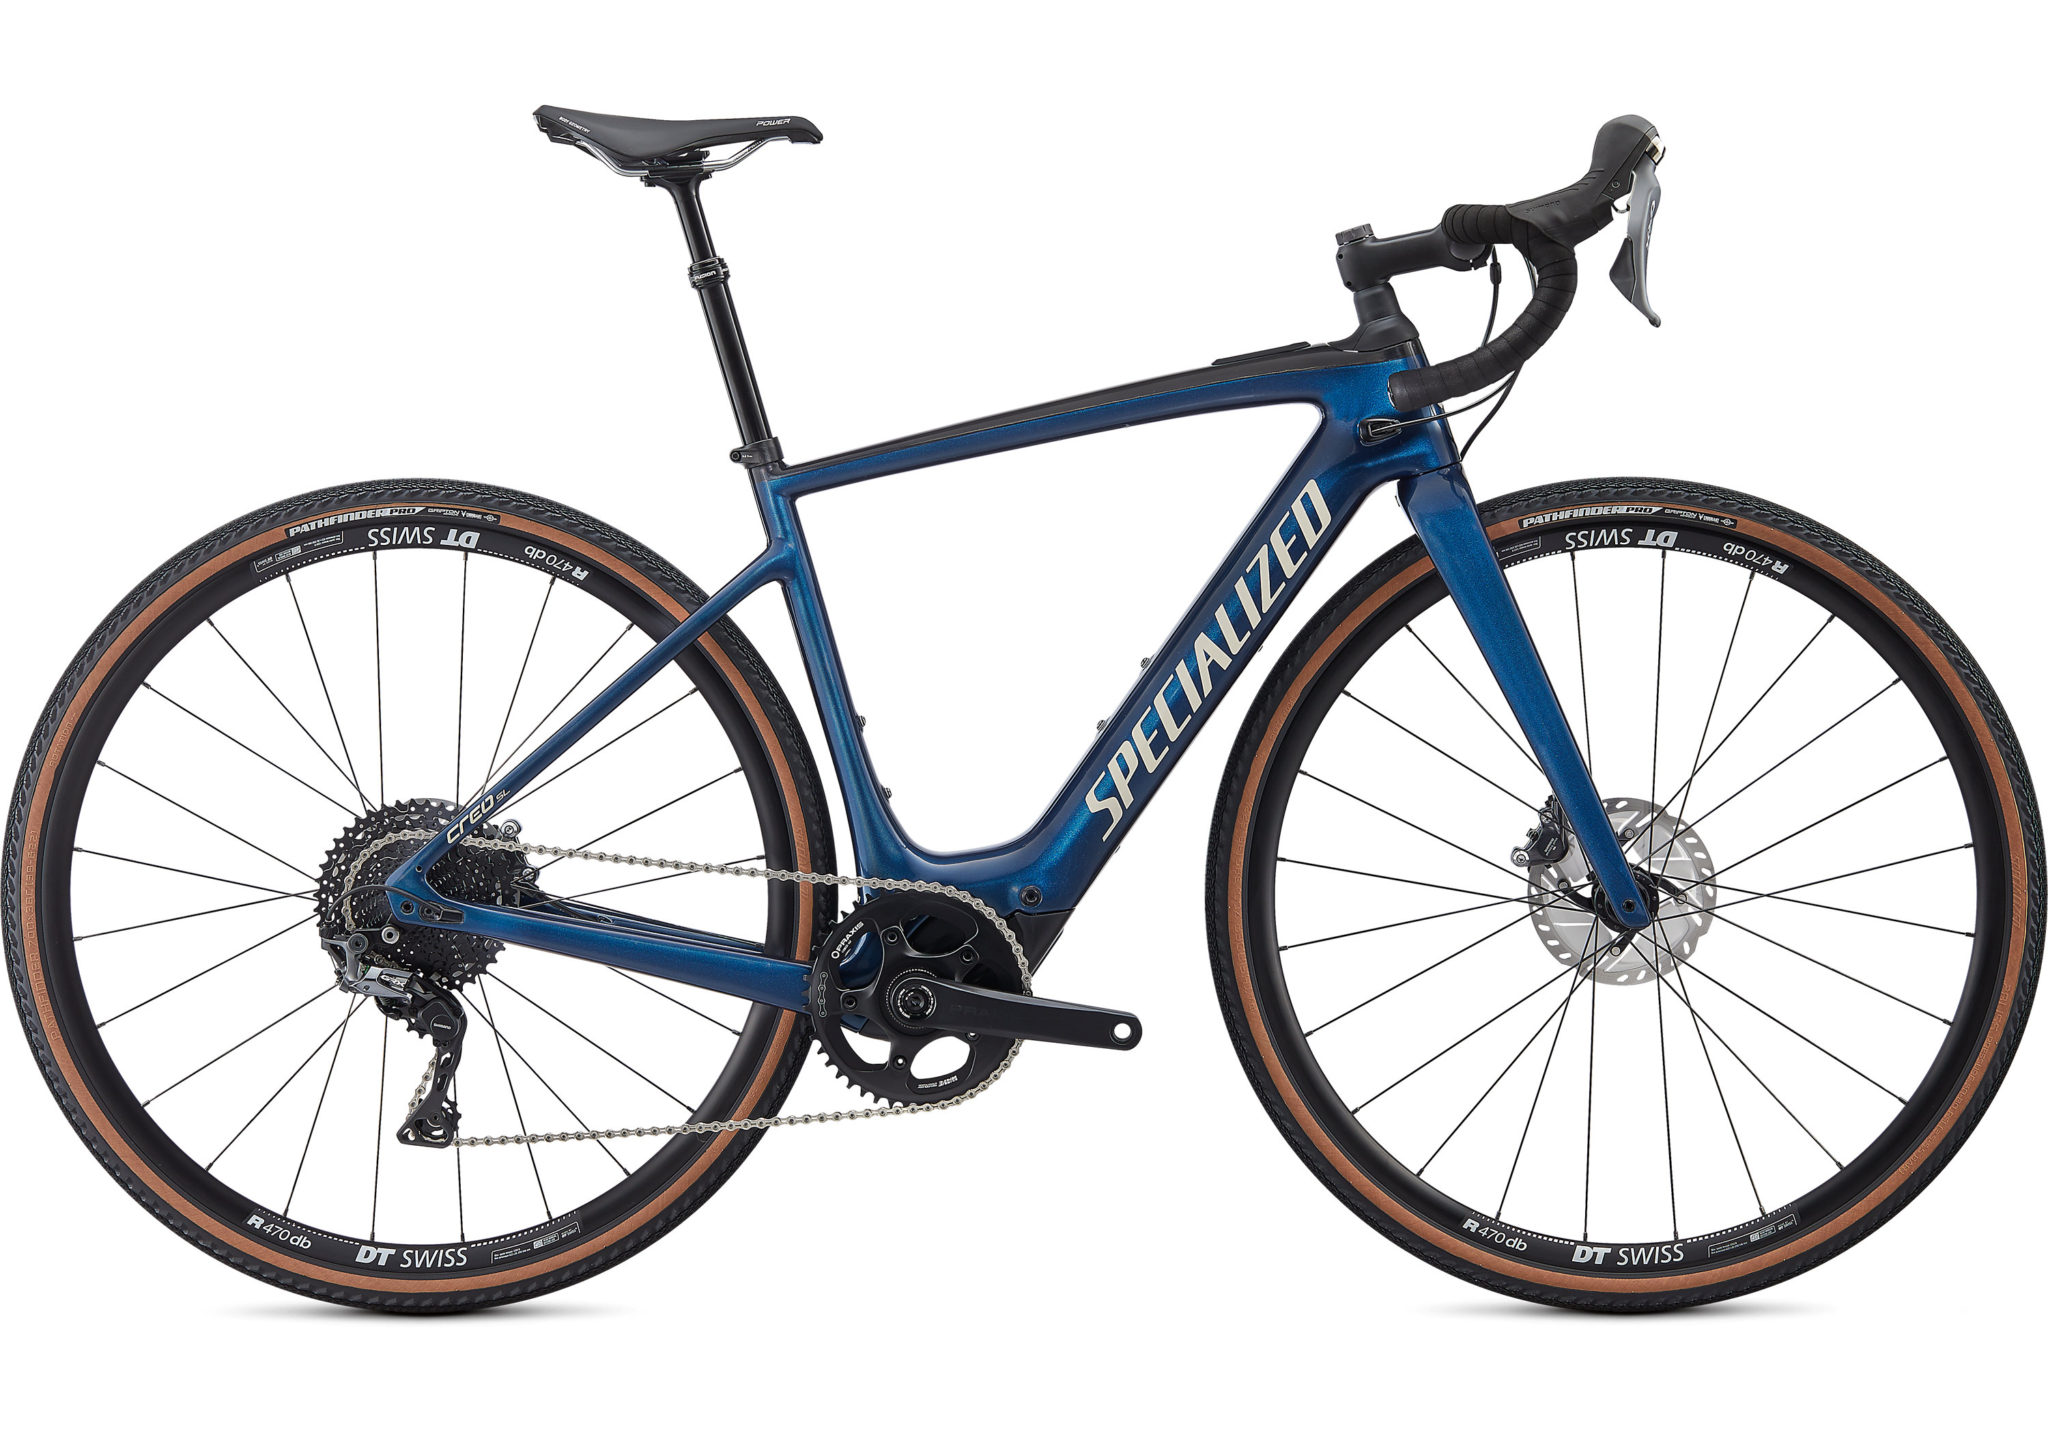 Turbo-Creo-SL-Comp-Carbon-EVO-Road-Bike-2020-1